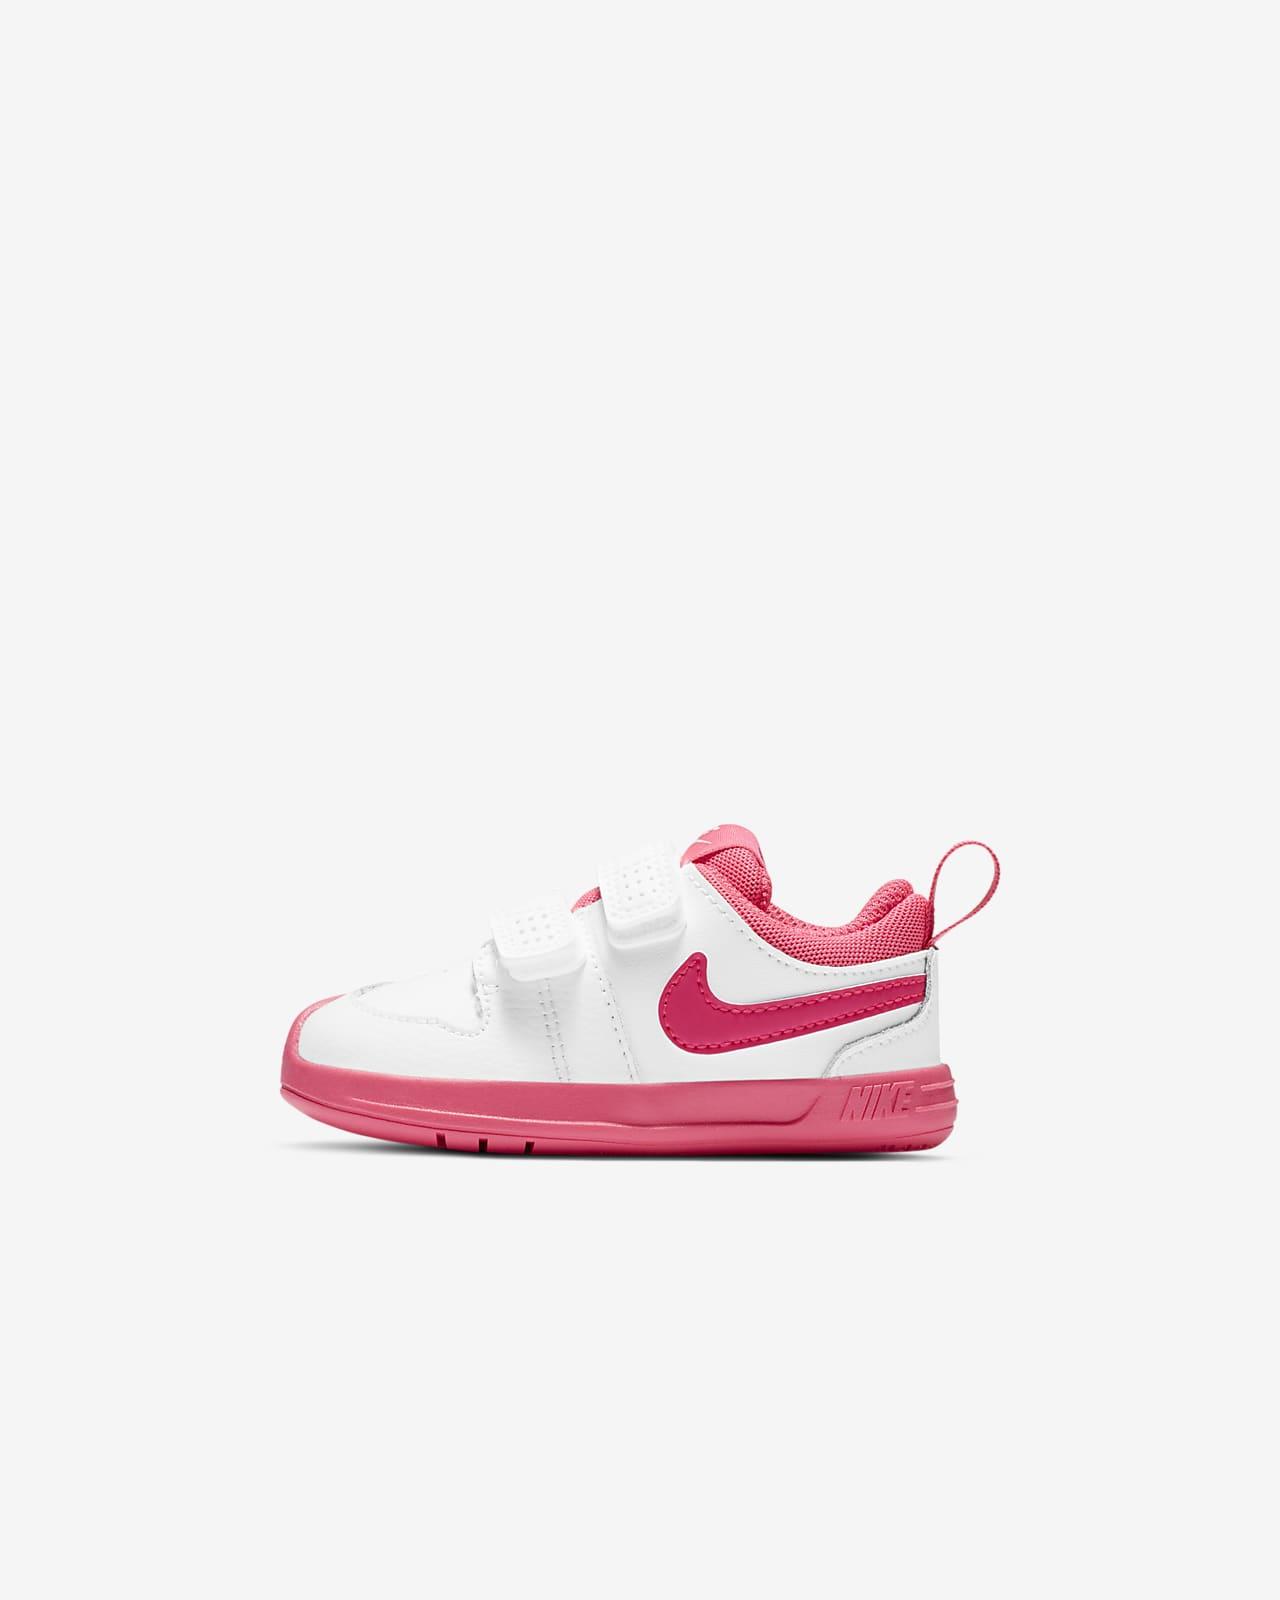 Nike Pico 5-sko til babyer/småbørn